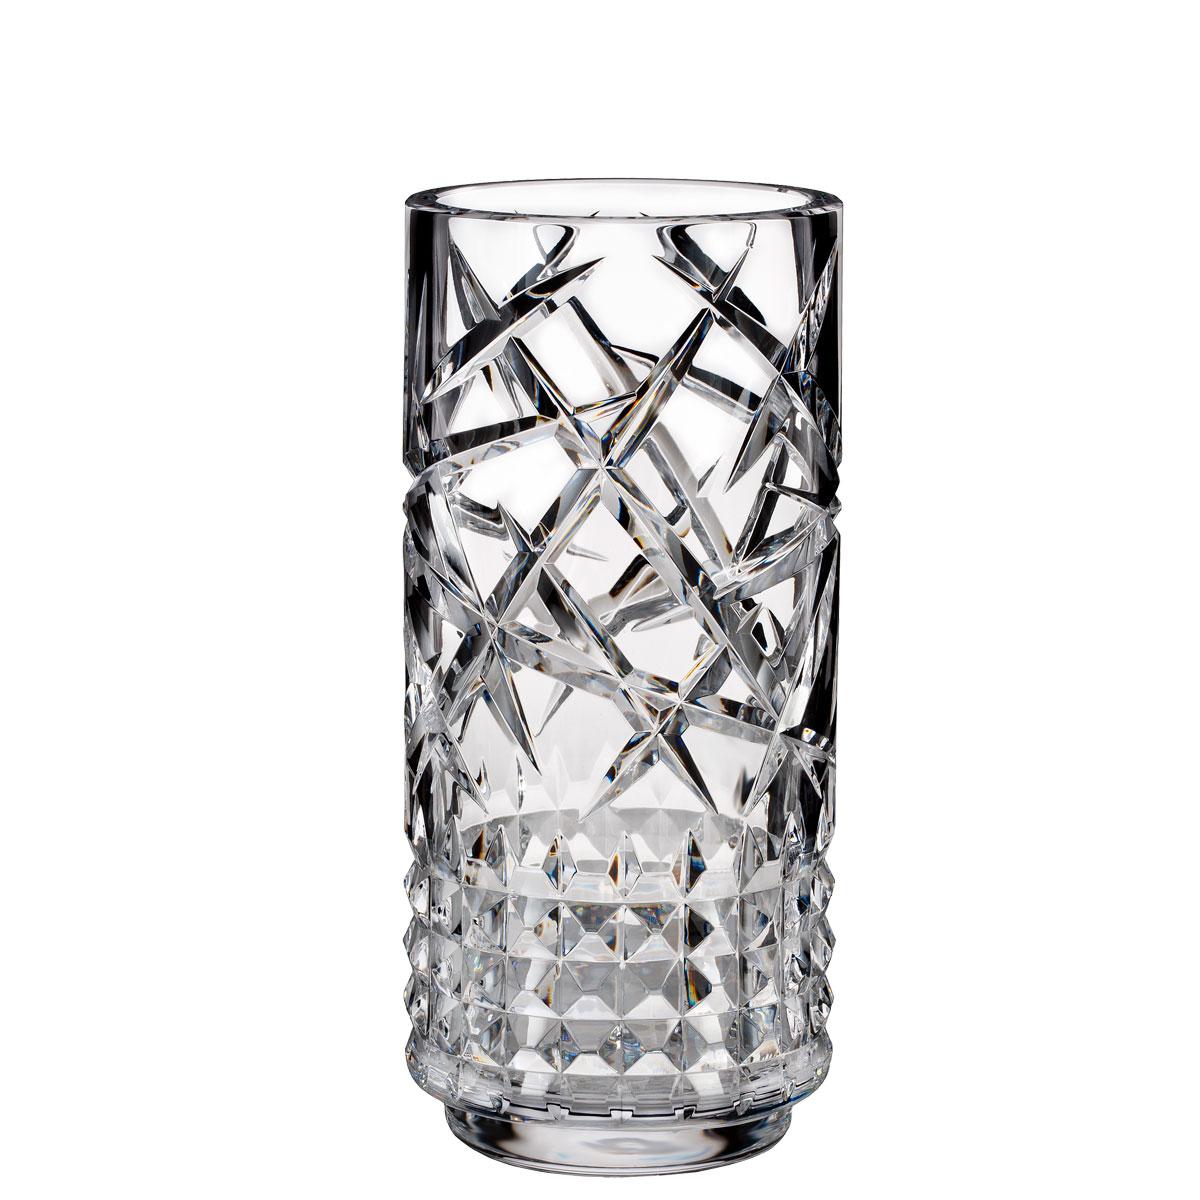 "Waterford Crystal, Jeff Leatham Fleurology Tina 12"" Crystal Vase"